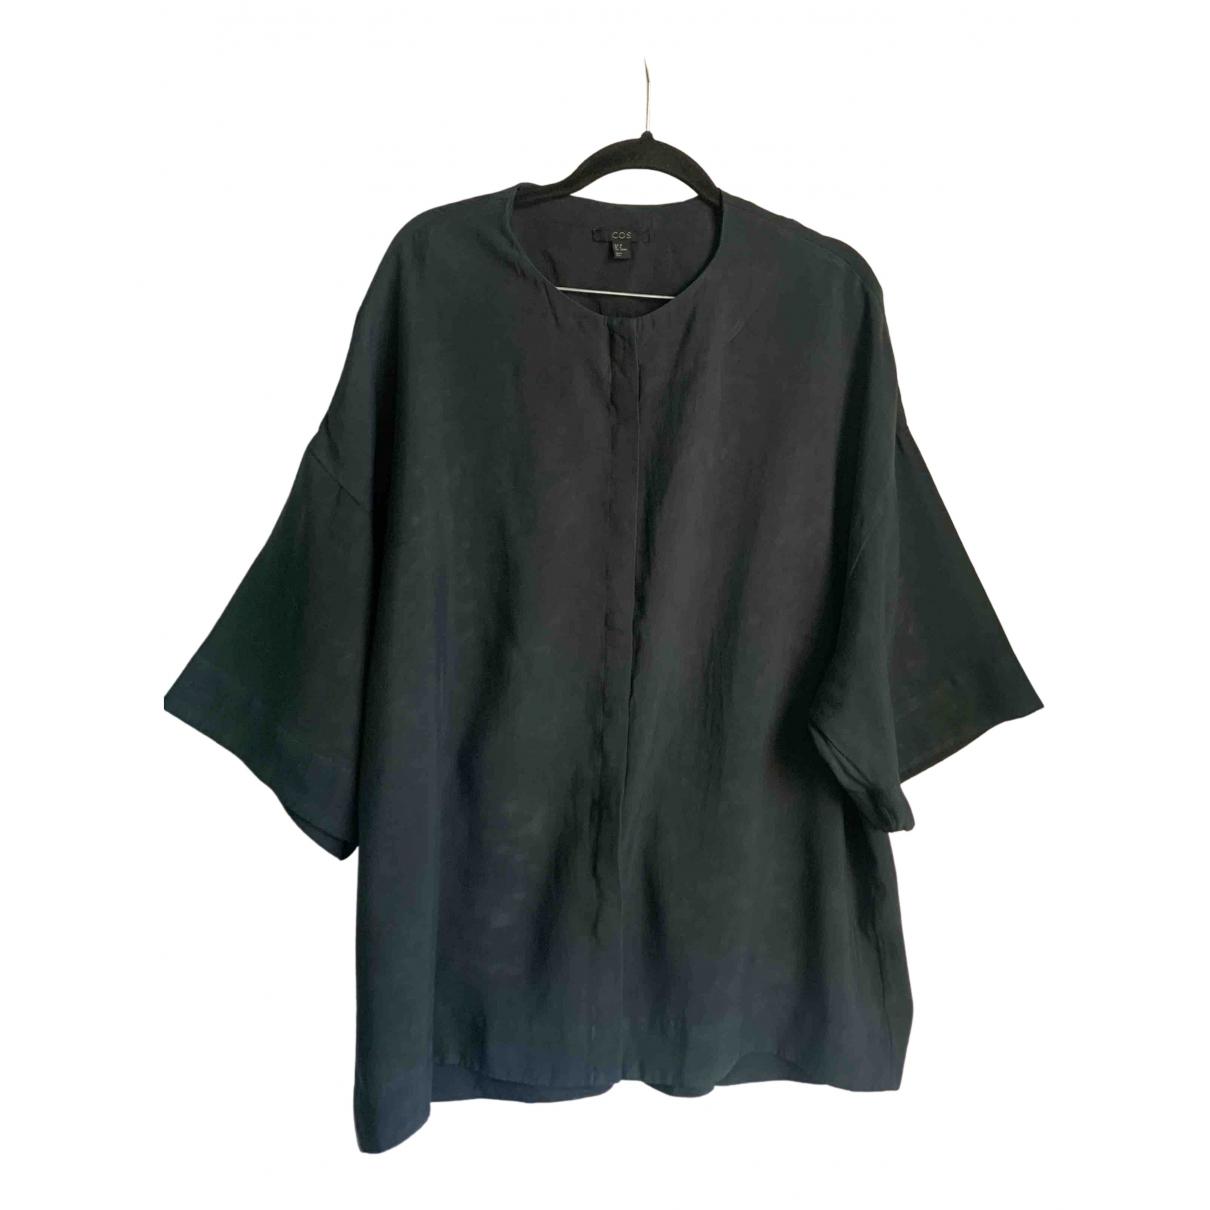 Cos \N Black  top for Women 38 FR